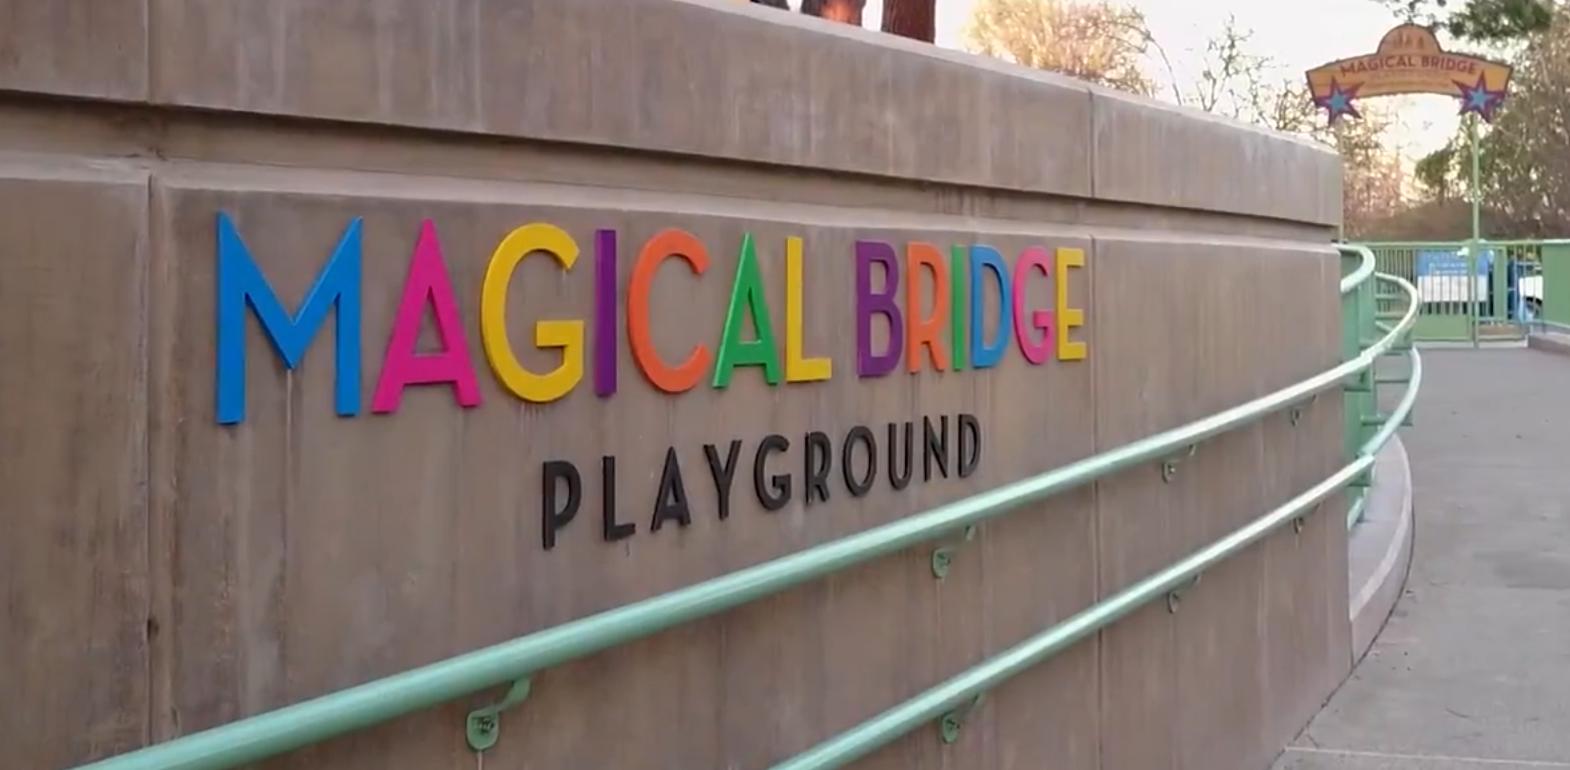 Apple Magical Bridge Playground